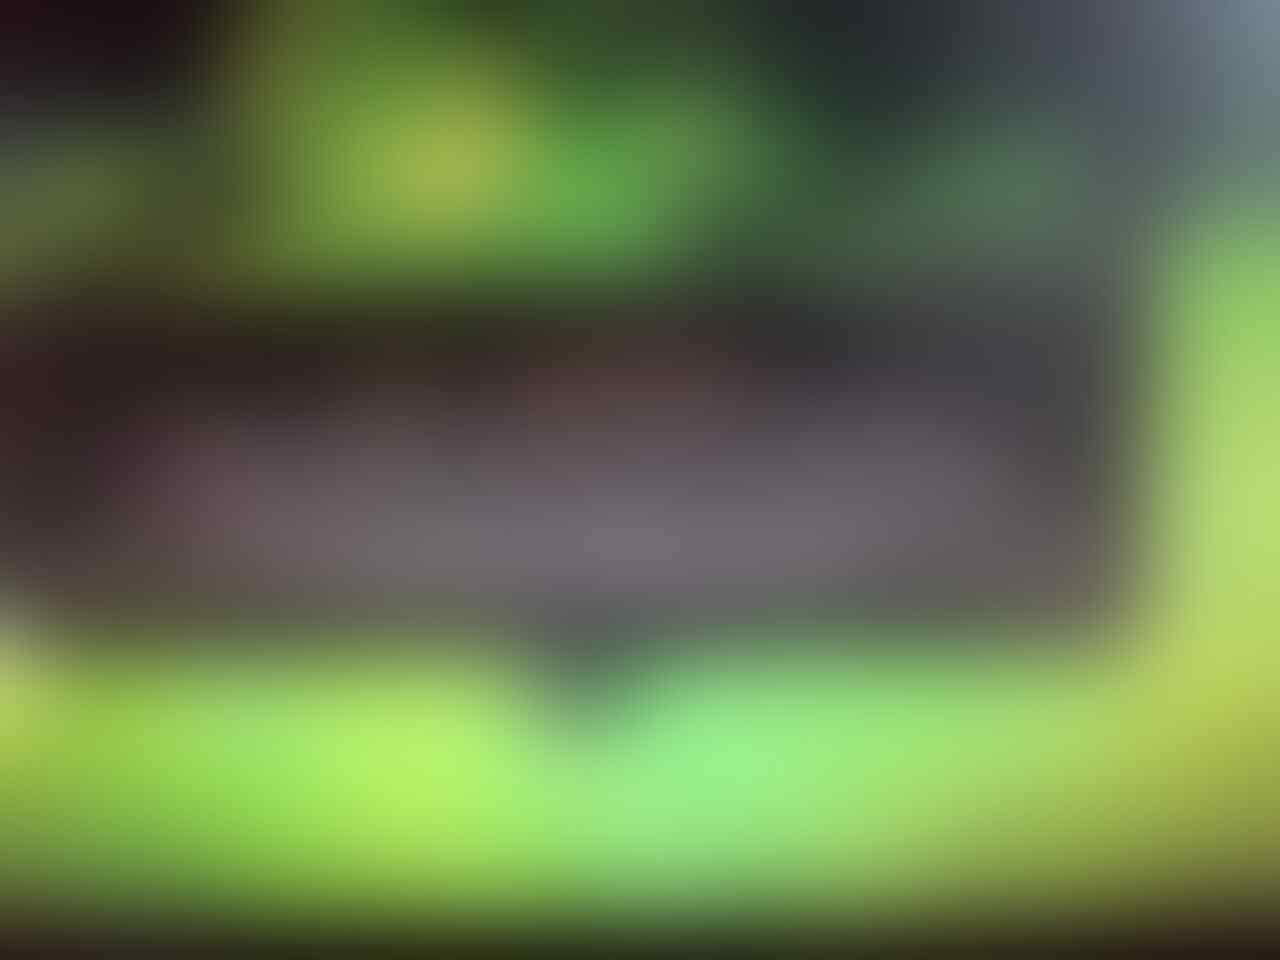 [OT] Tales of Zestiria - Let's Begin Our Tale on PC